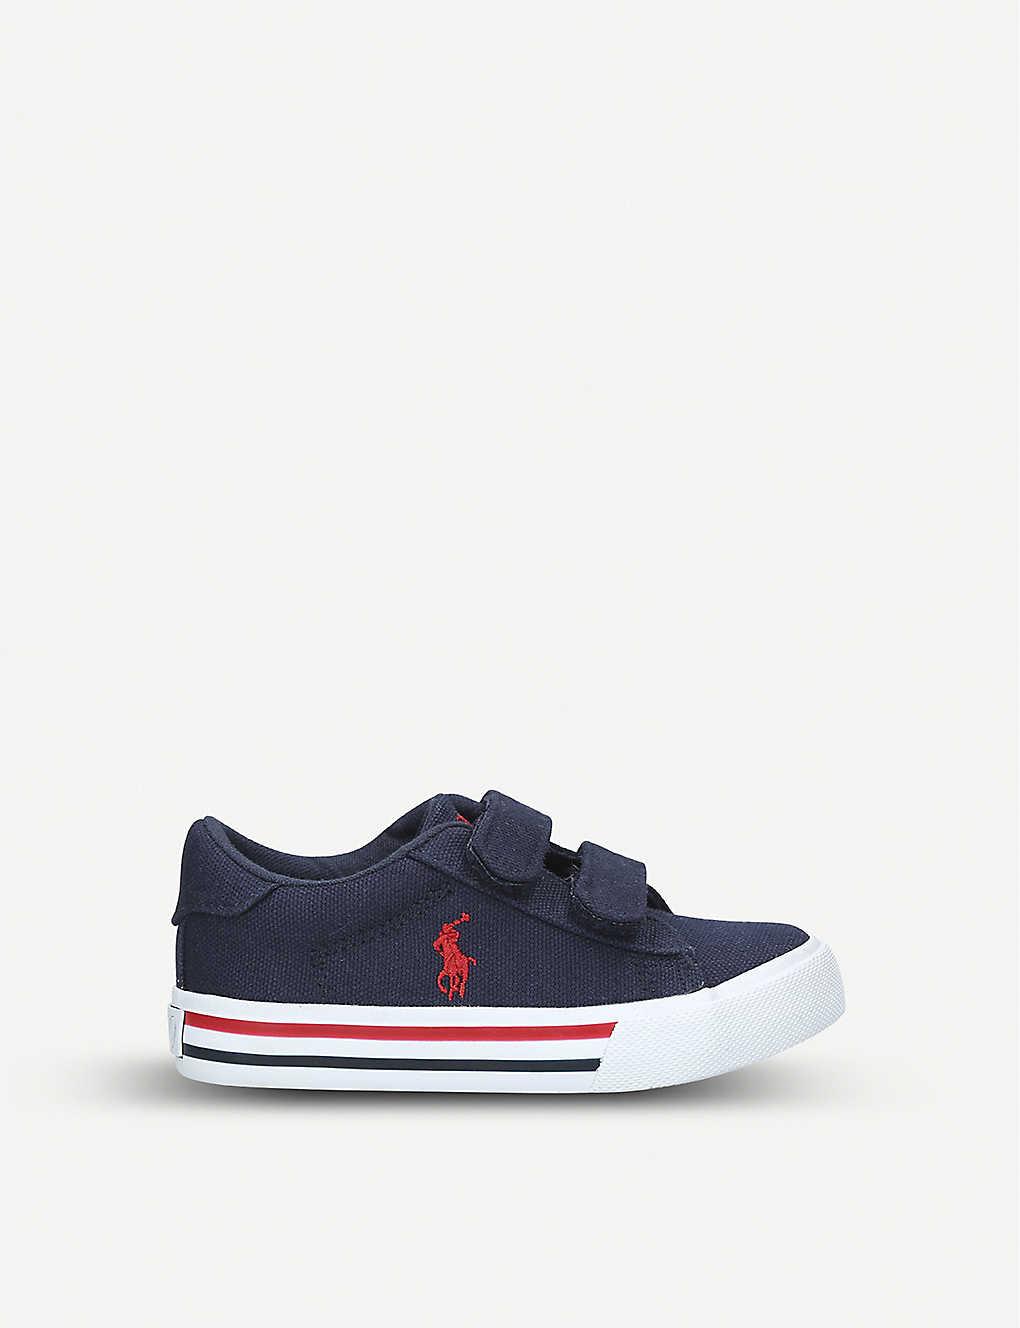 5cb56d60d5 POLO RALPH LAUREN - Easten ez canvas sneakers (6 months-4 years ...